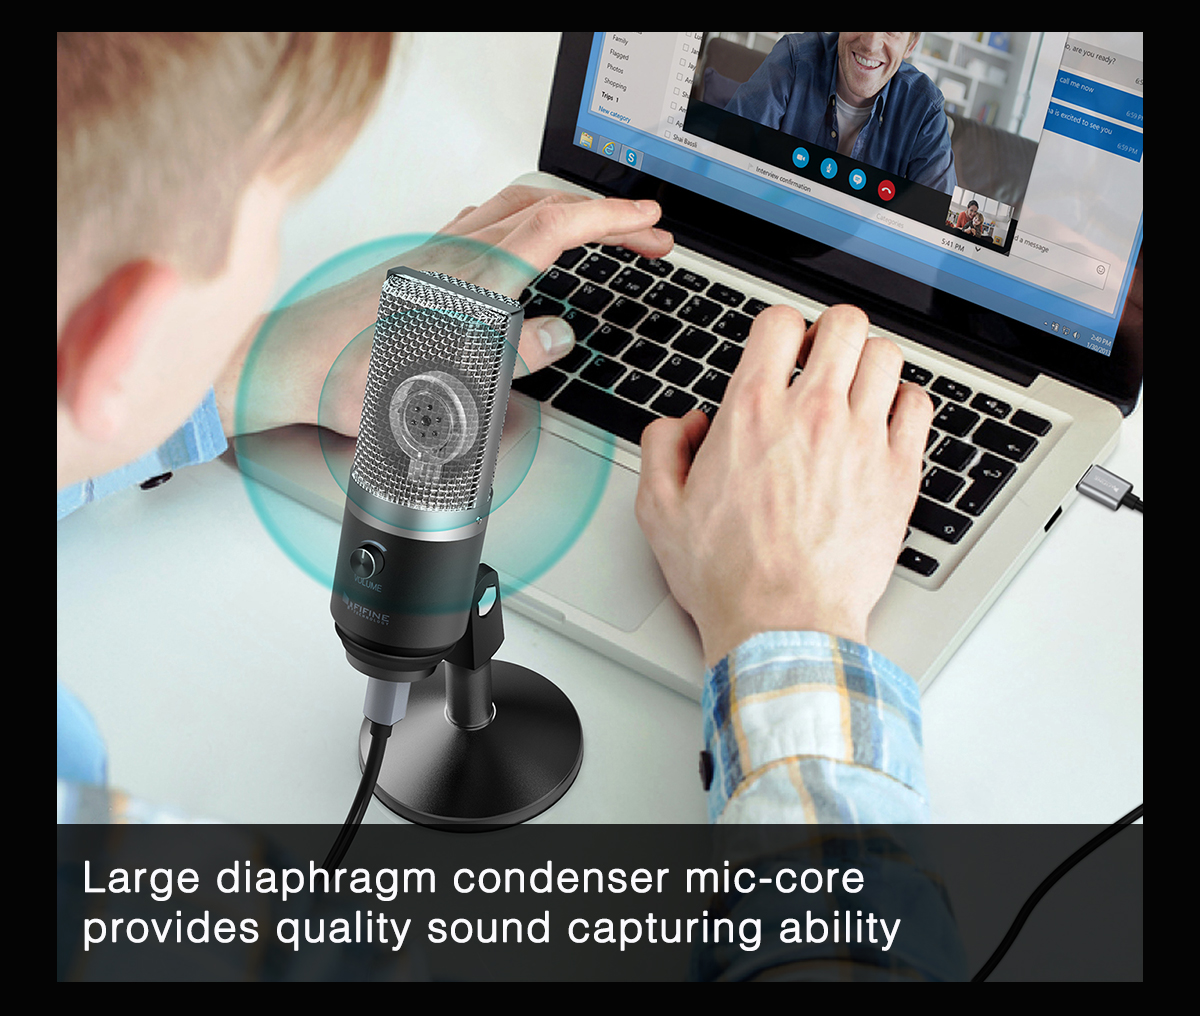 FIFINE Uni-Directional USB Microphone 5